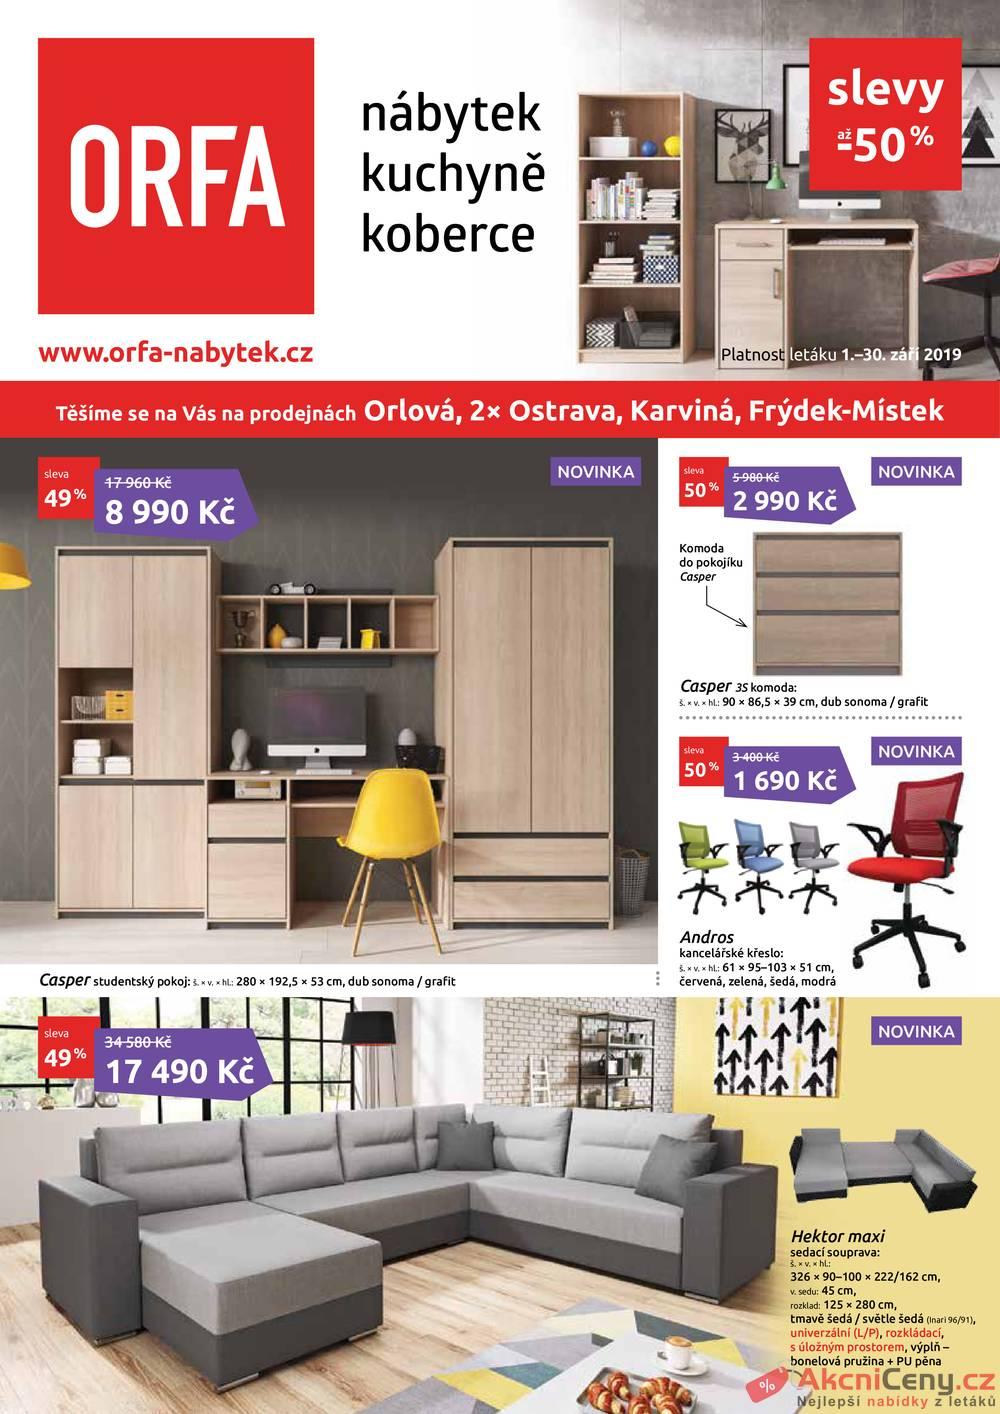 Leták Orfa Nábytek - Orfa Nábytek od 1.9. do 30.9.2019 - strana 1